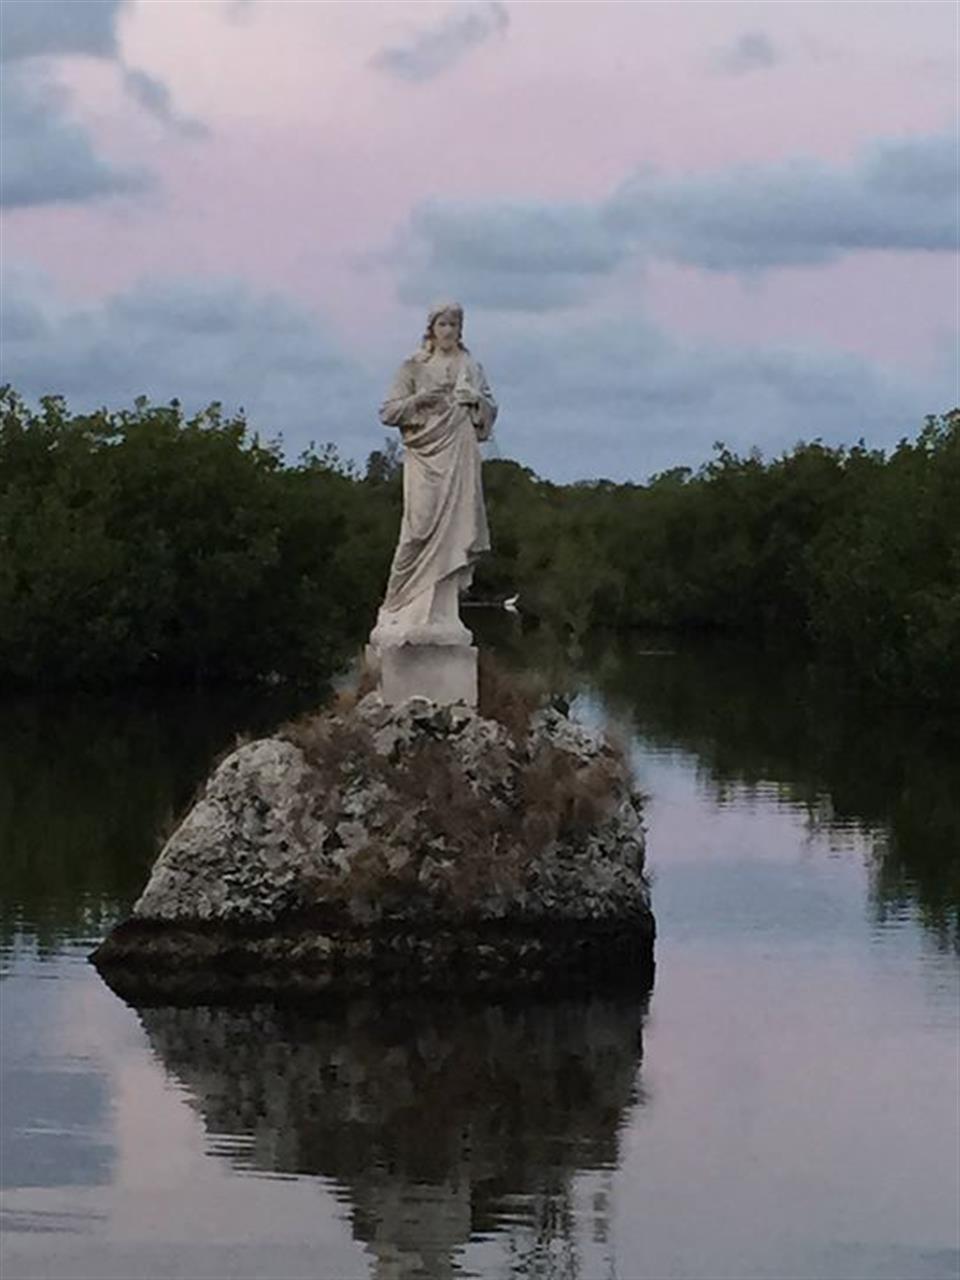 Christ Statue - Tavernier, FL #Tavernier #FLKeys